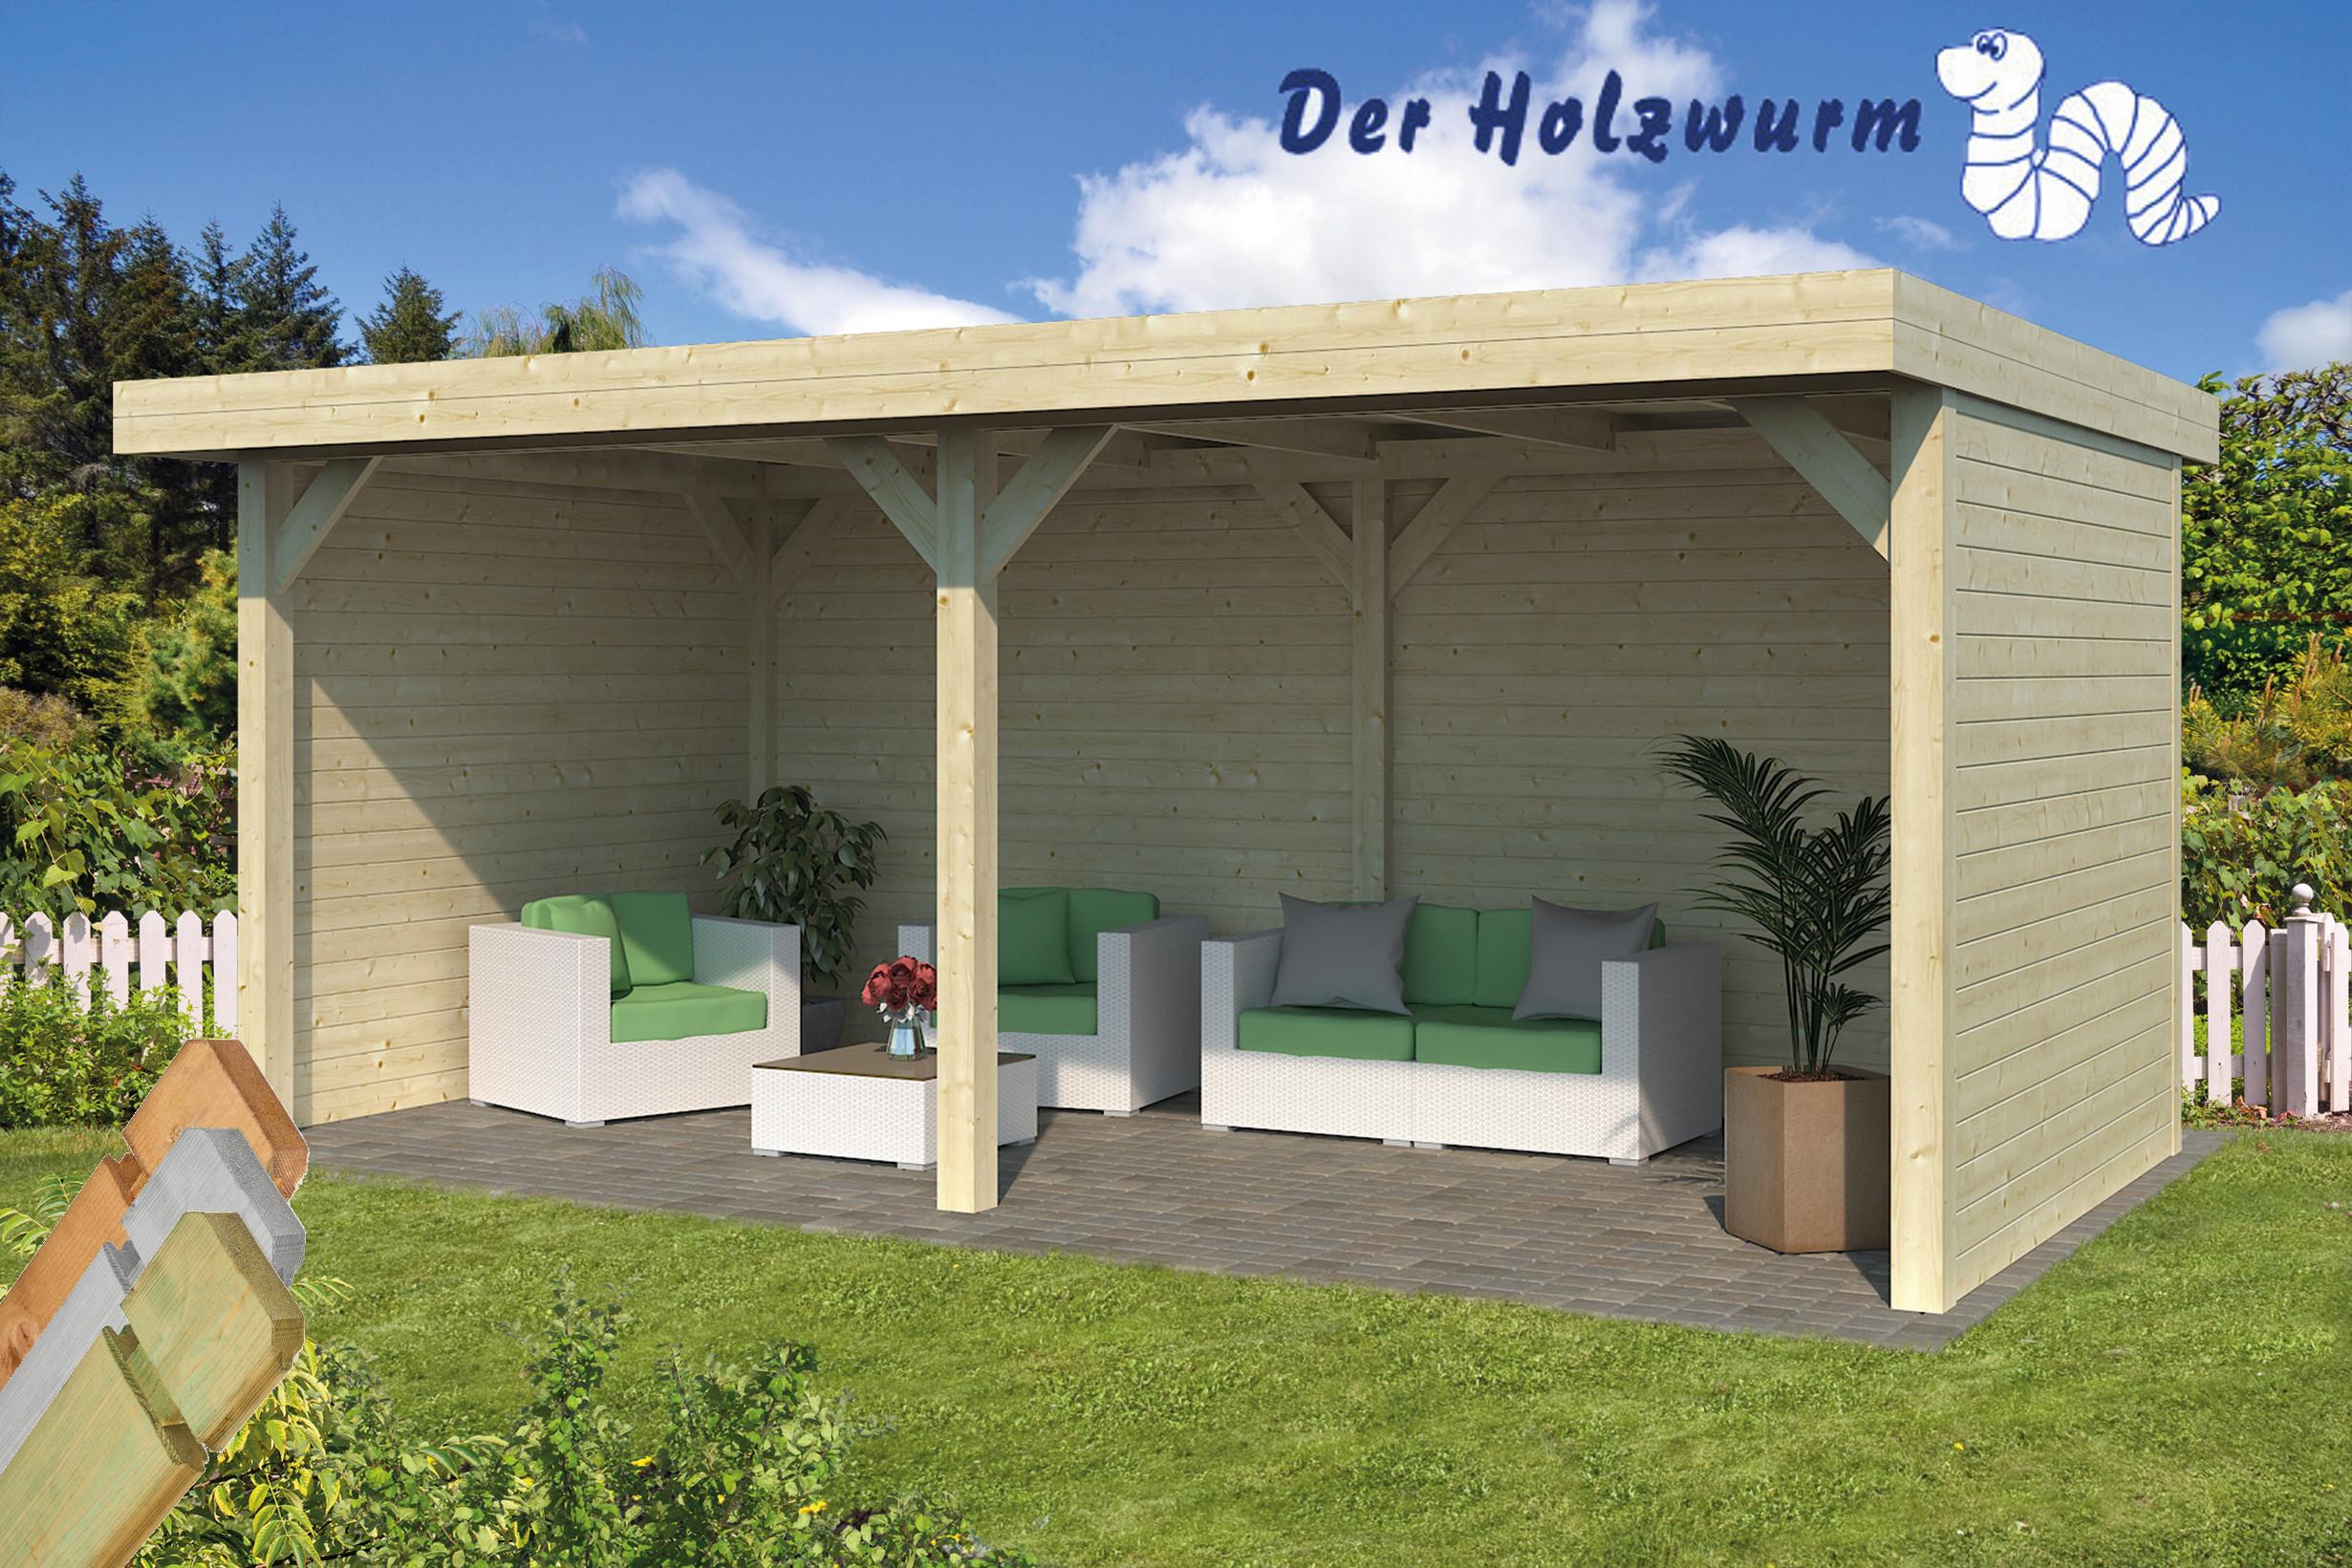 gartenhaus alfsu 28 mm ca 598x300 cm holzwurm obersayn. Black Bedroom Furniture Sets. Home Design Ideas